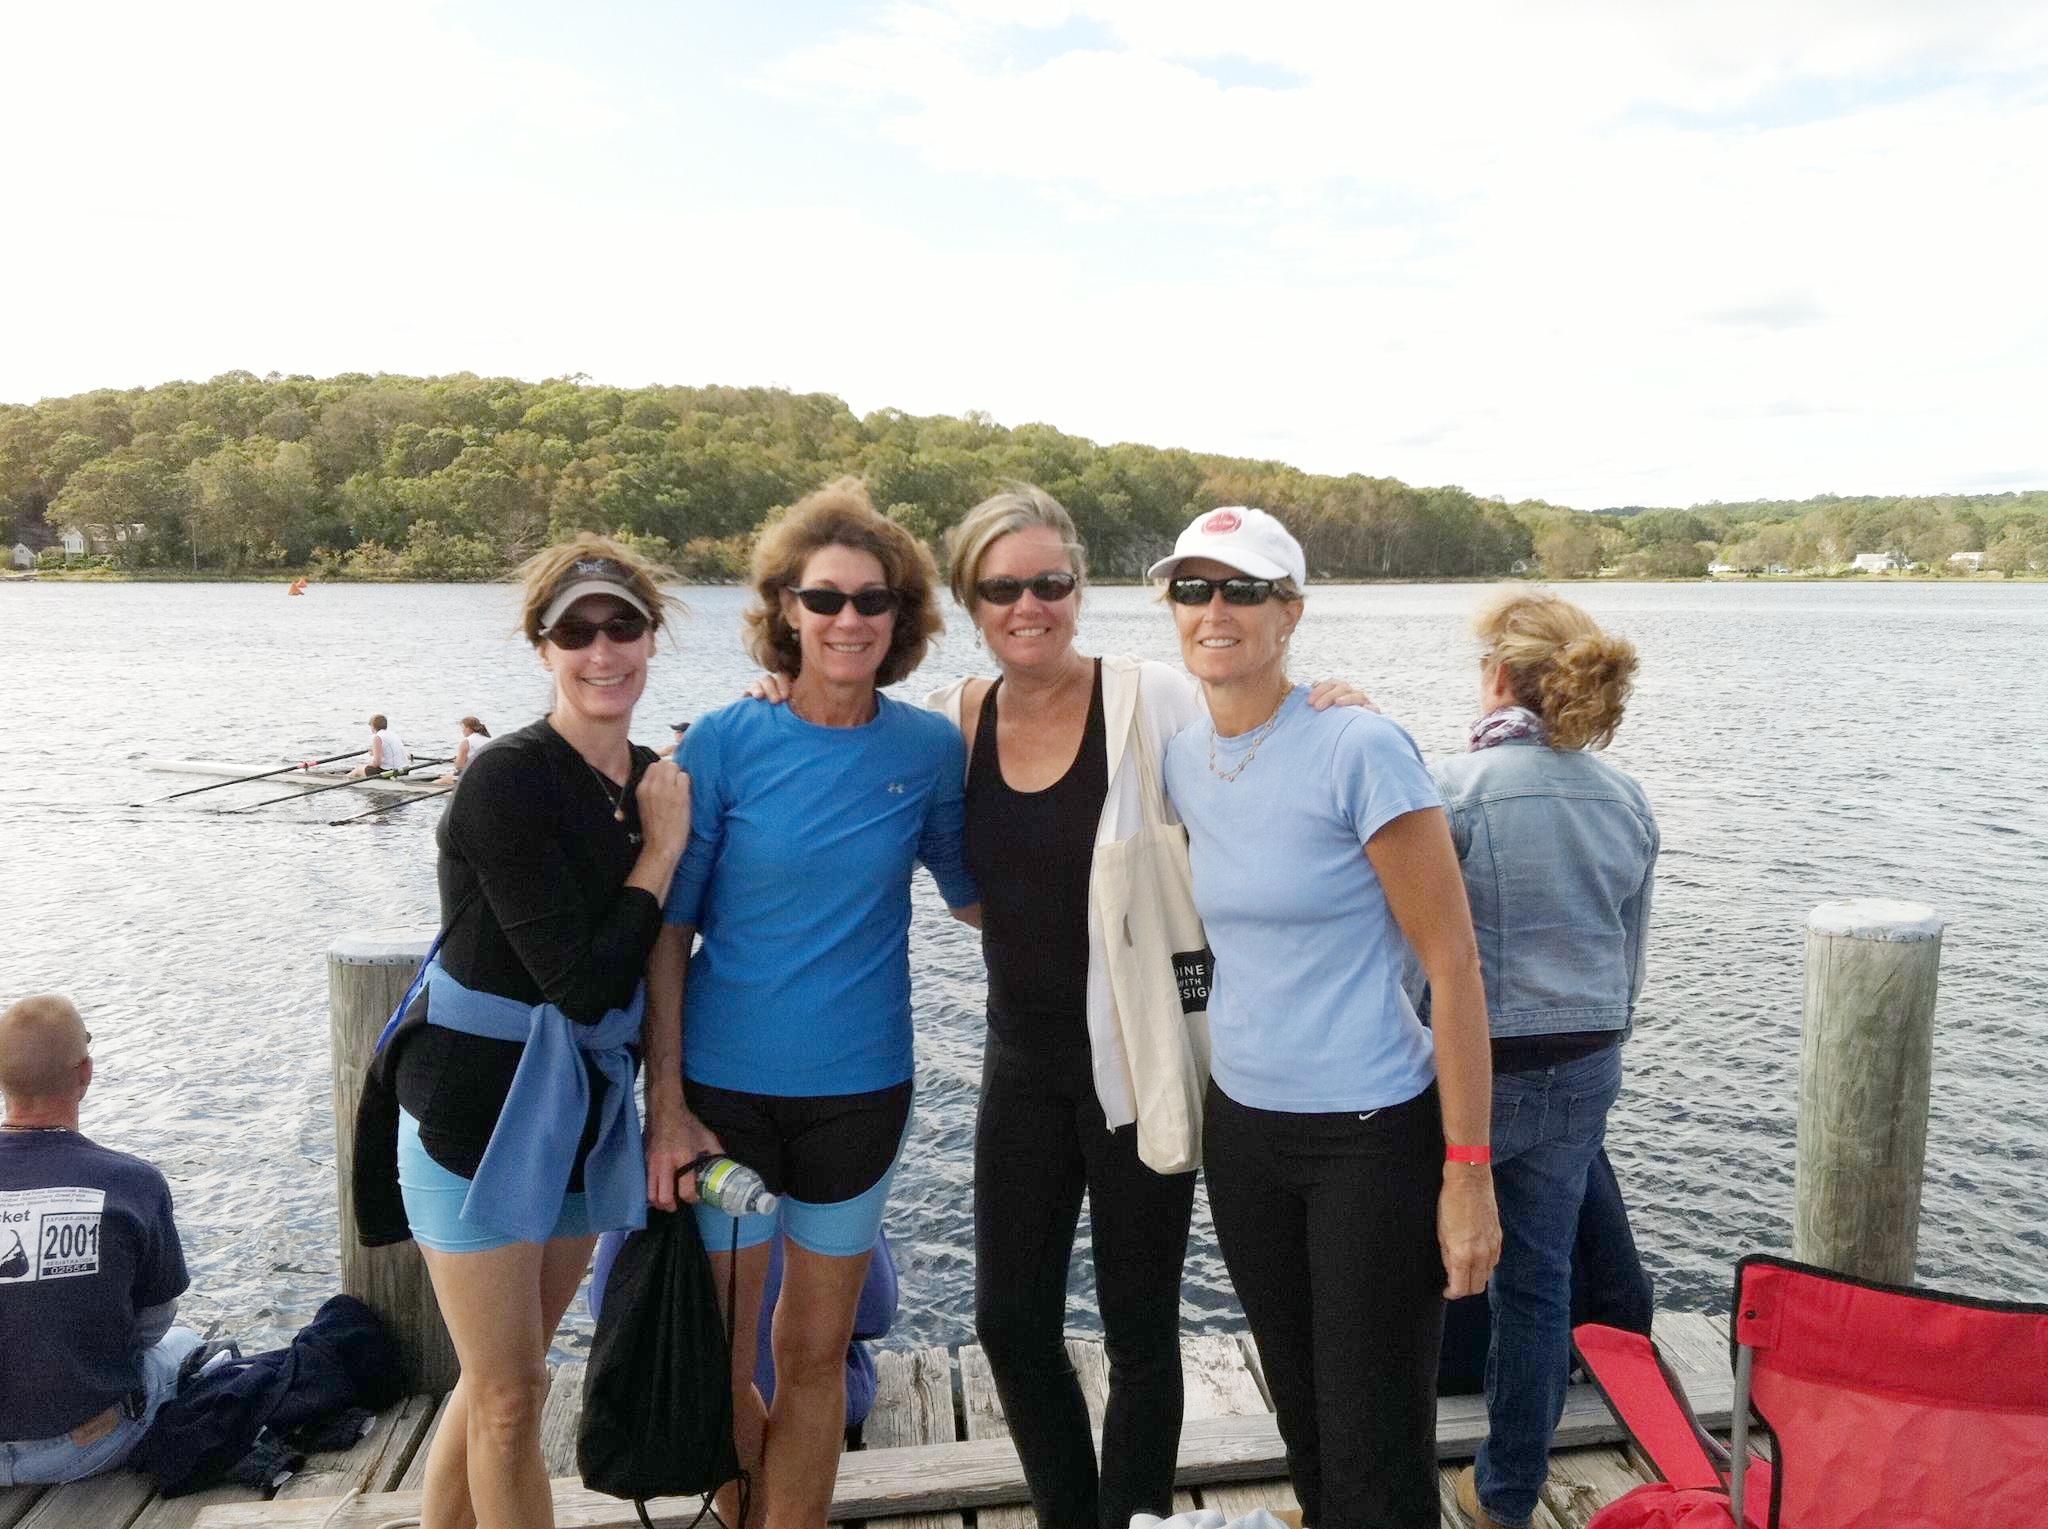 My inspiring friends at the Norwalk Rowing Club!